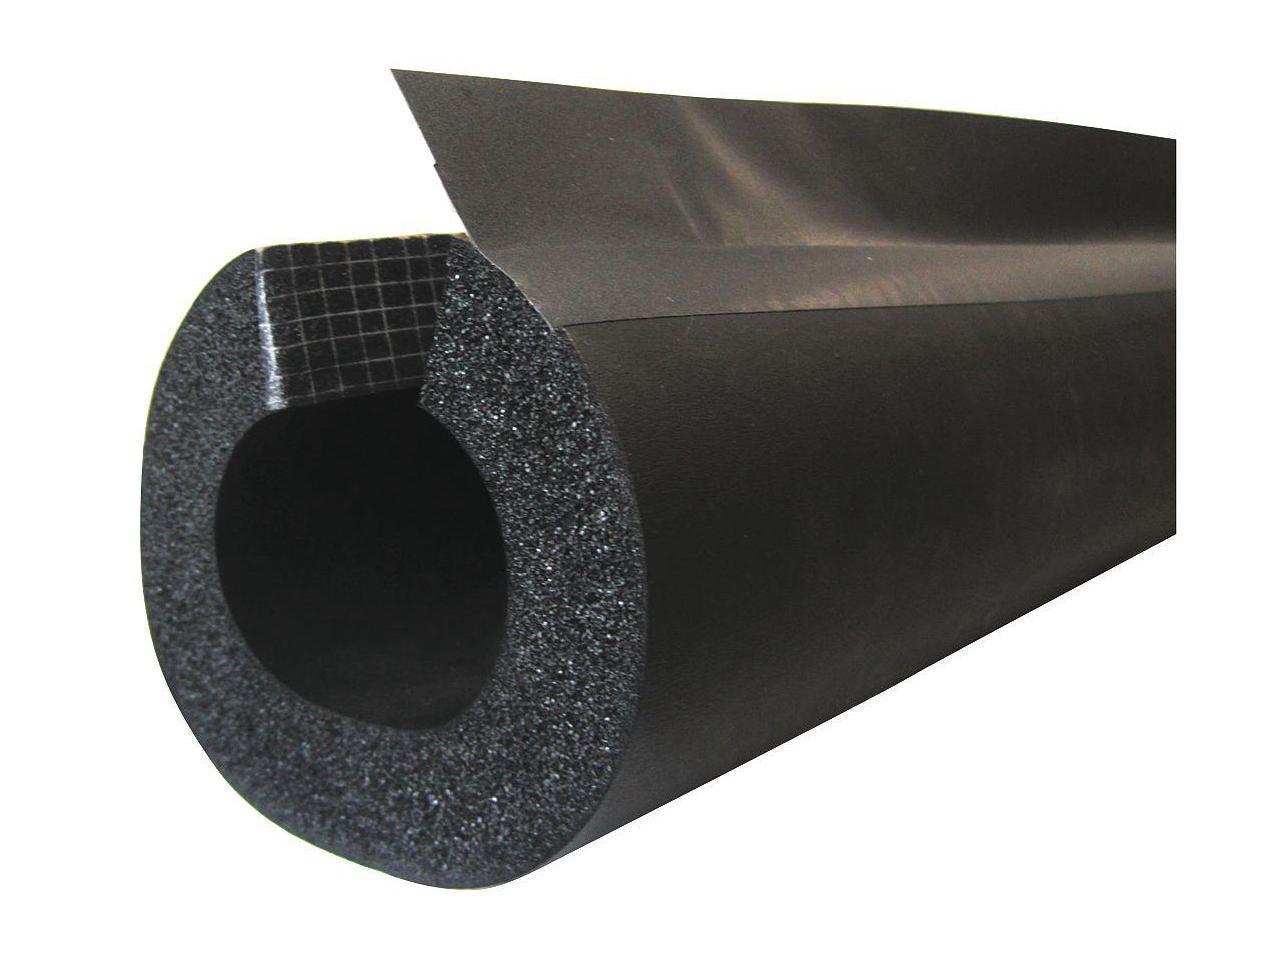 238-AC41238 ID,6 ft. AEROFLEX Pipe Ins.,EPDM,4-1//2 in Black